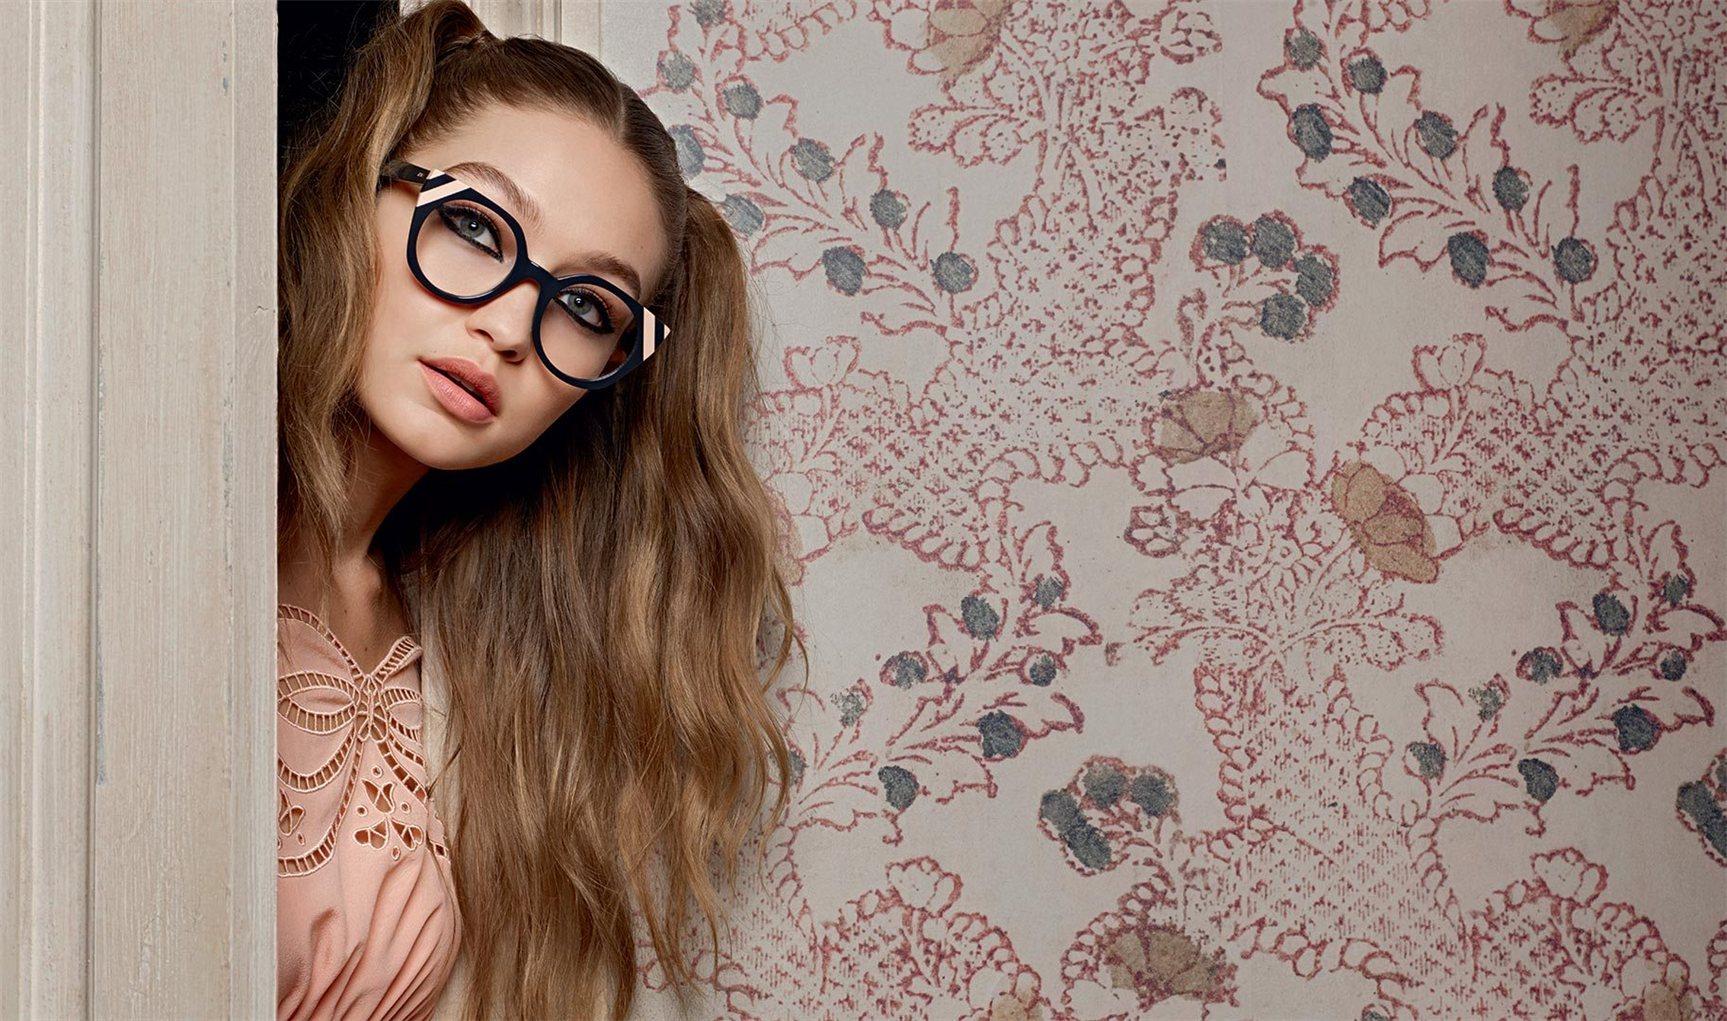 Fendi spring/summer 2017 - Bella Hadid, Gigi Hadid, Vittoria Ceretti by Karl Lagerfeld